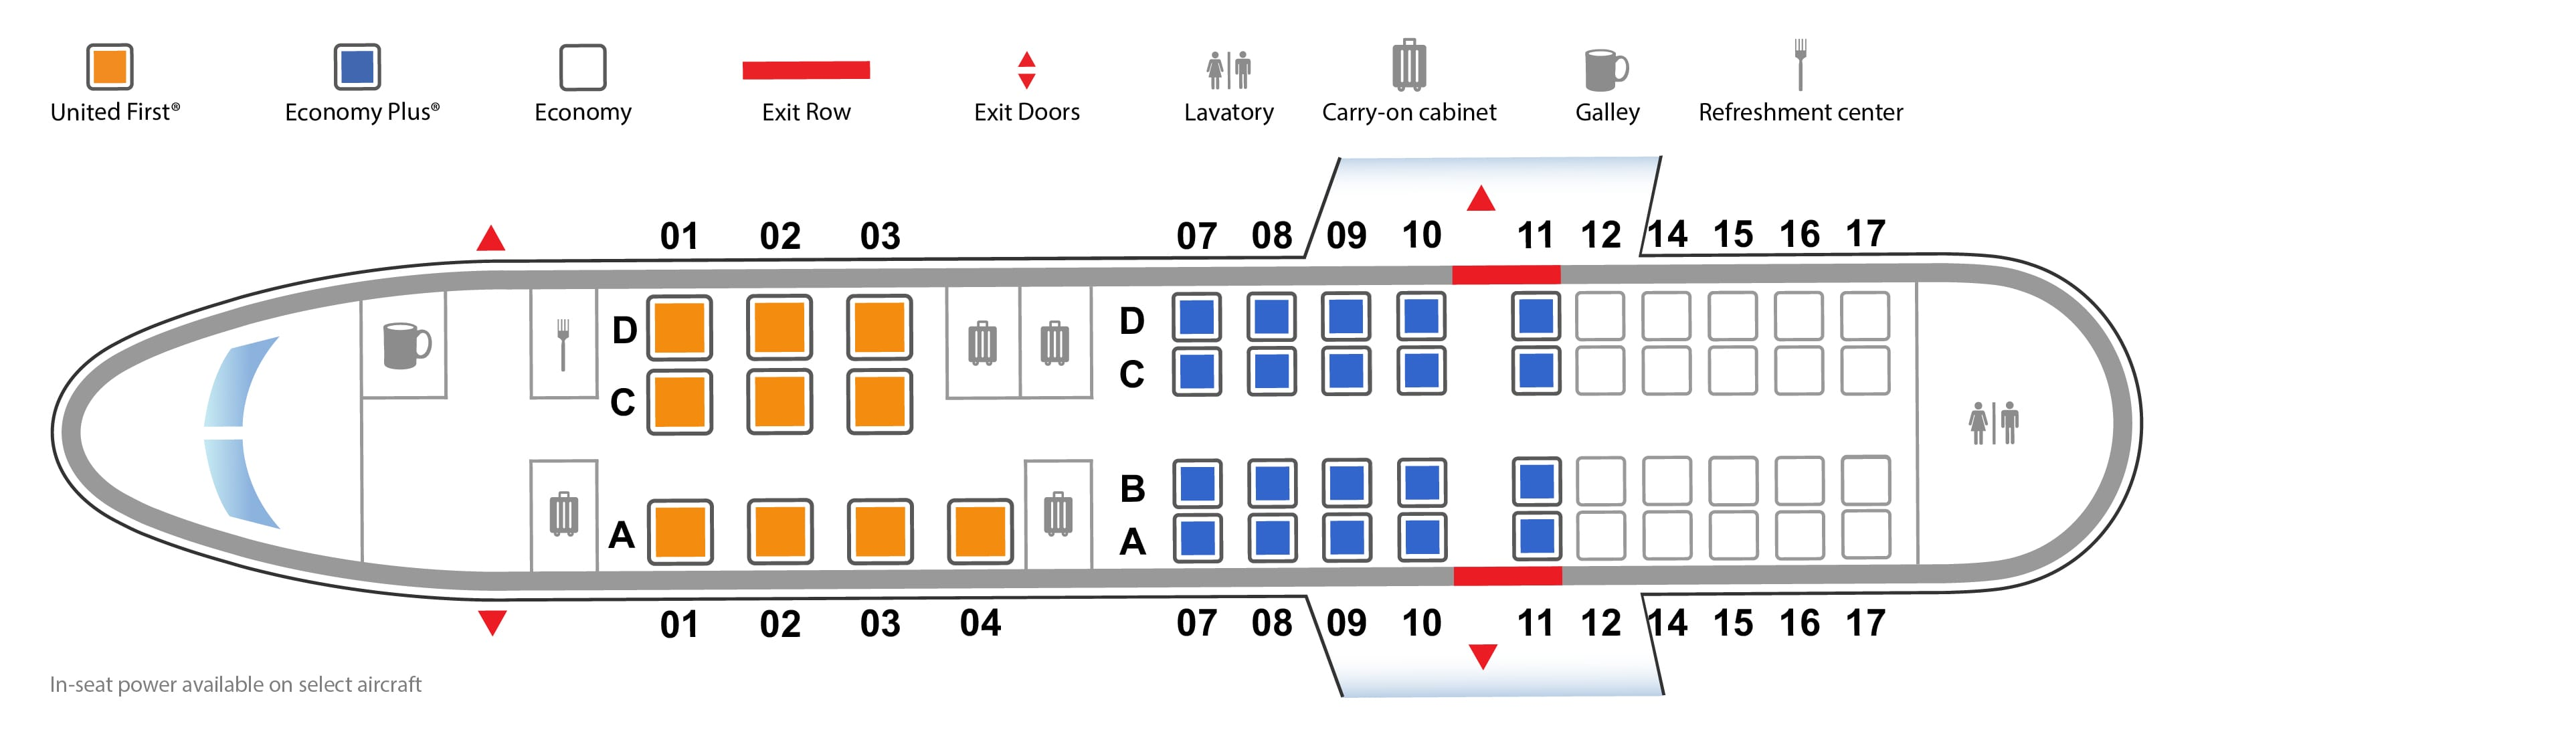 Bombardier CRJ 550 Seating map